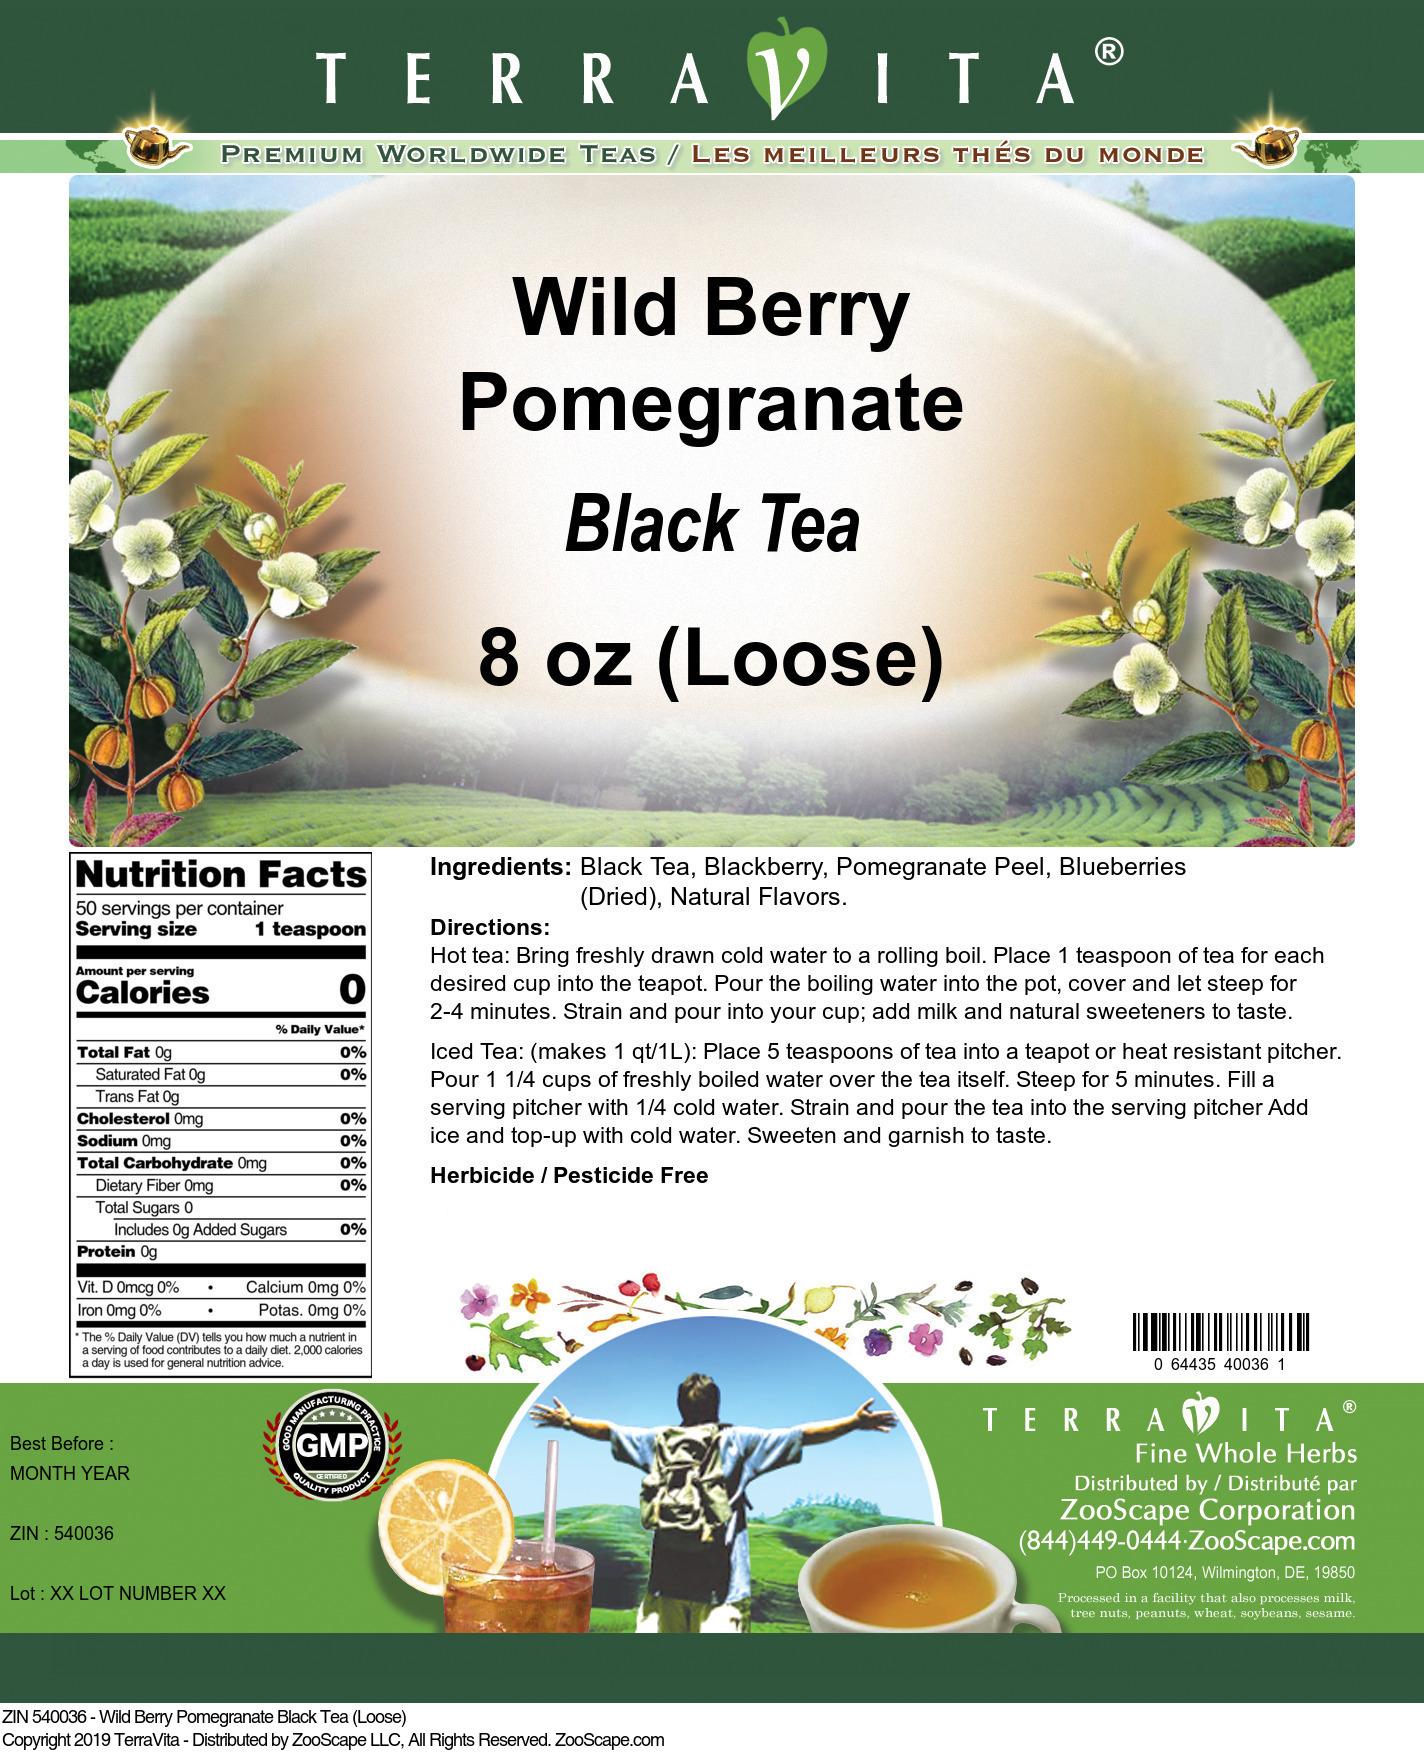 Wild Berry Pomegranate Black Tea